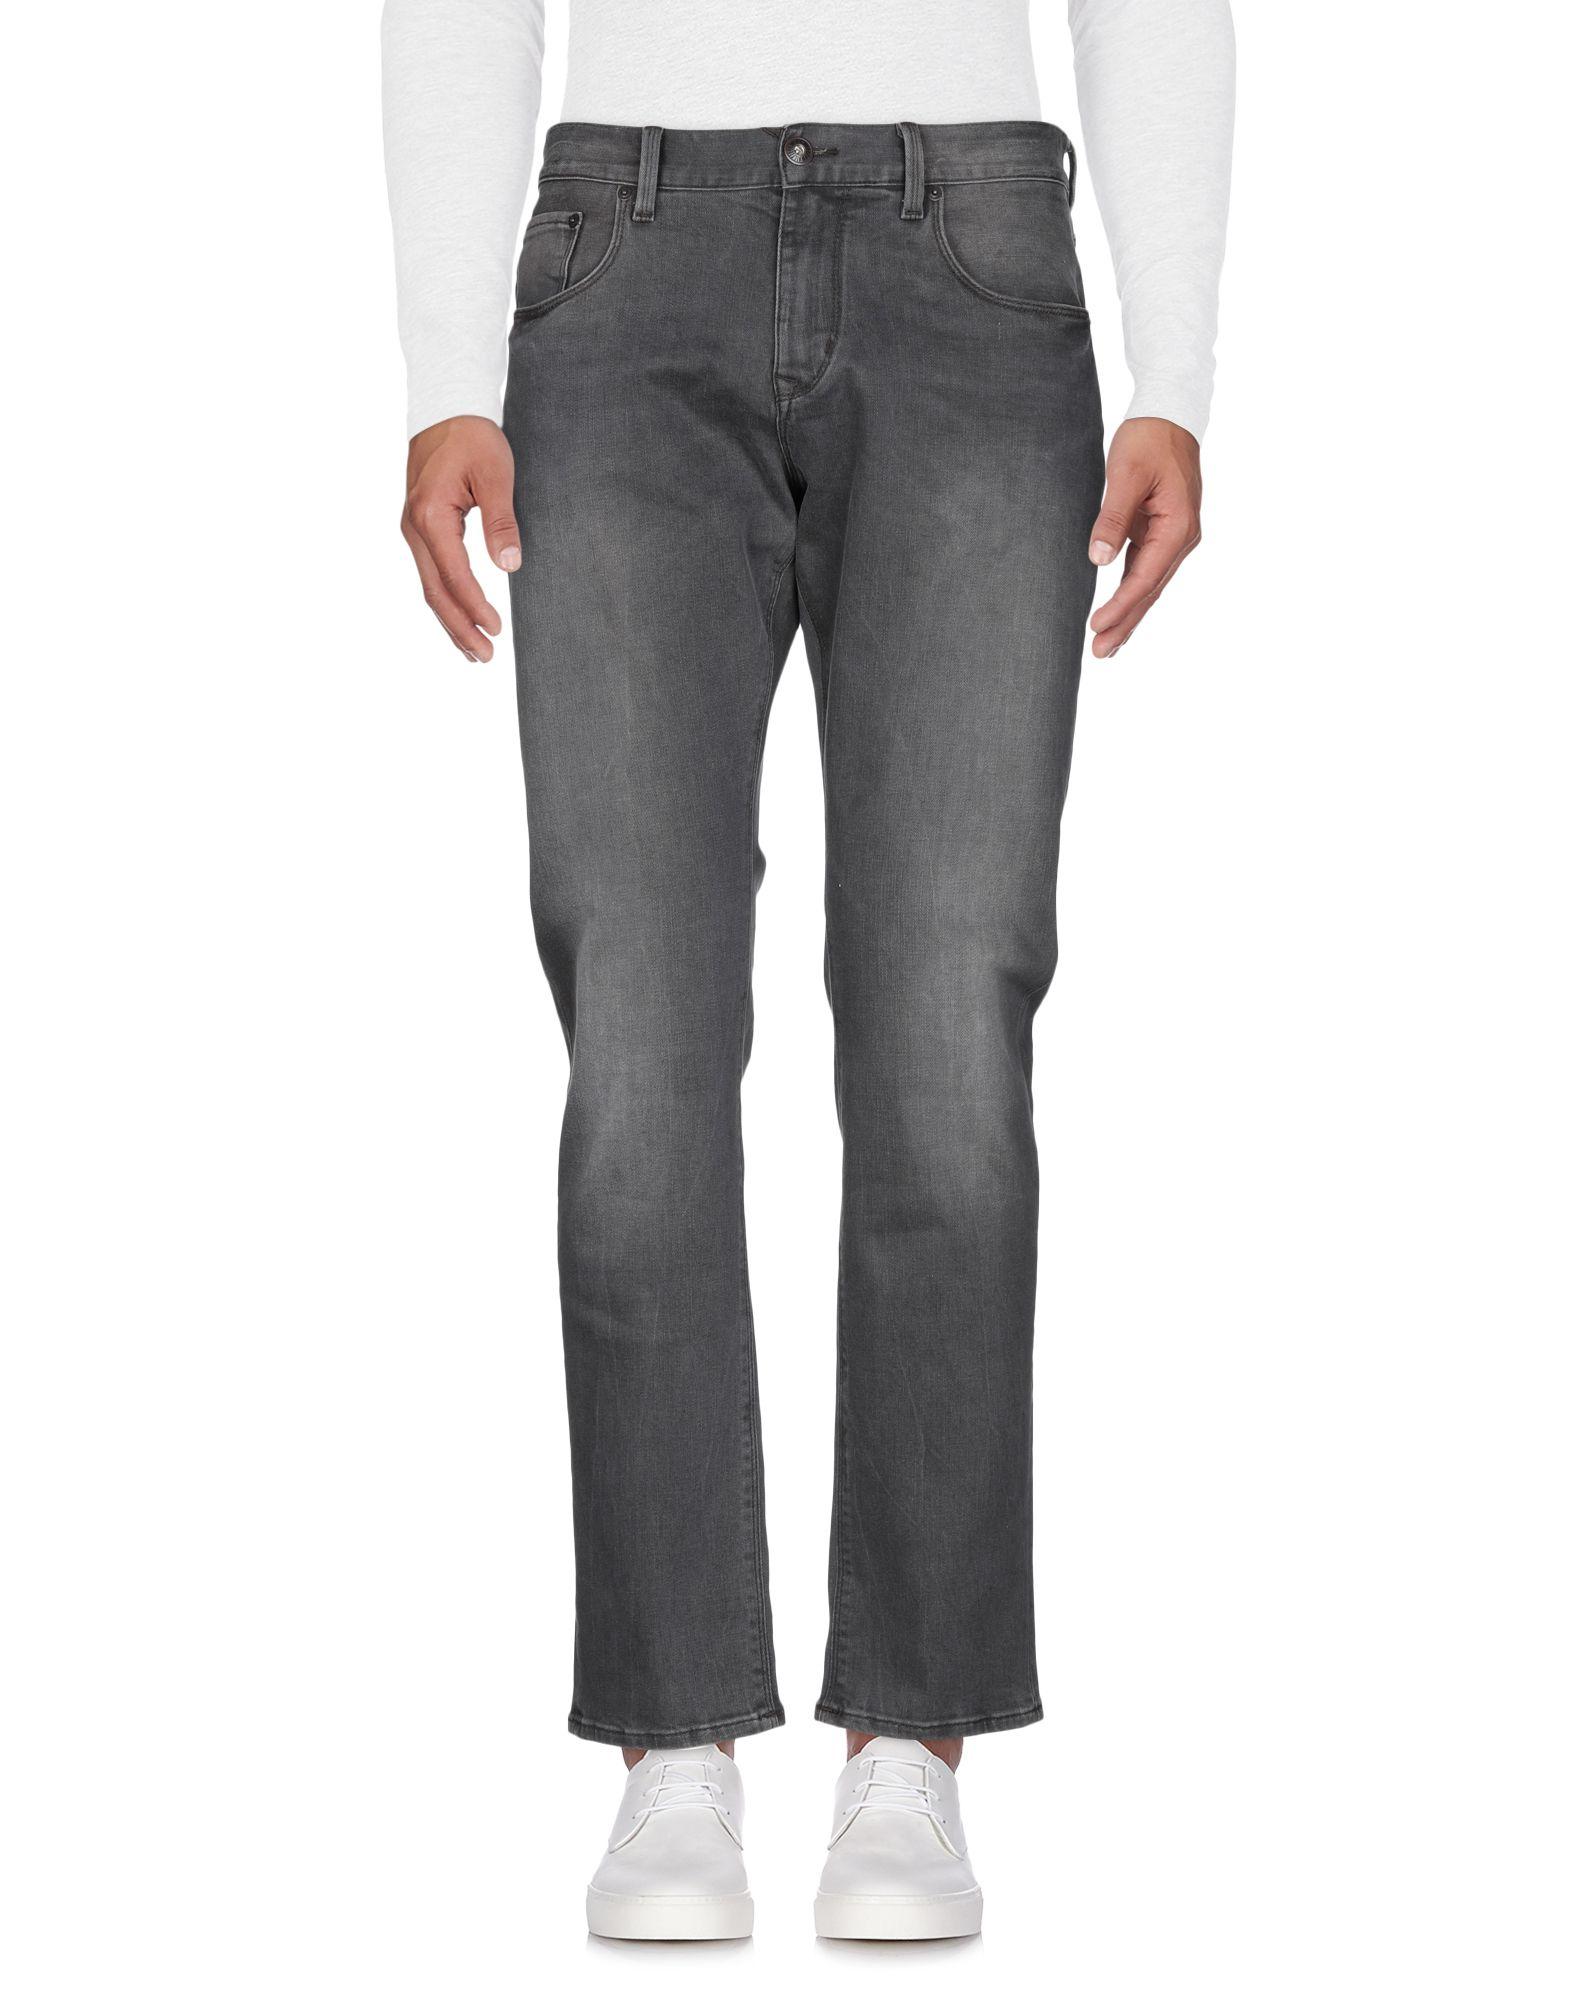 Pantaloni Jeans Tommy Hilfiger Uomo Uomo Uomo - 42687048FX c90ef8